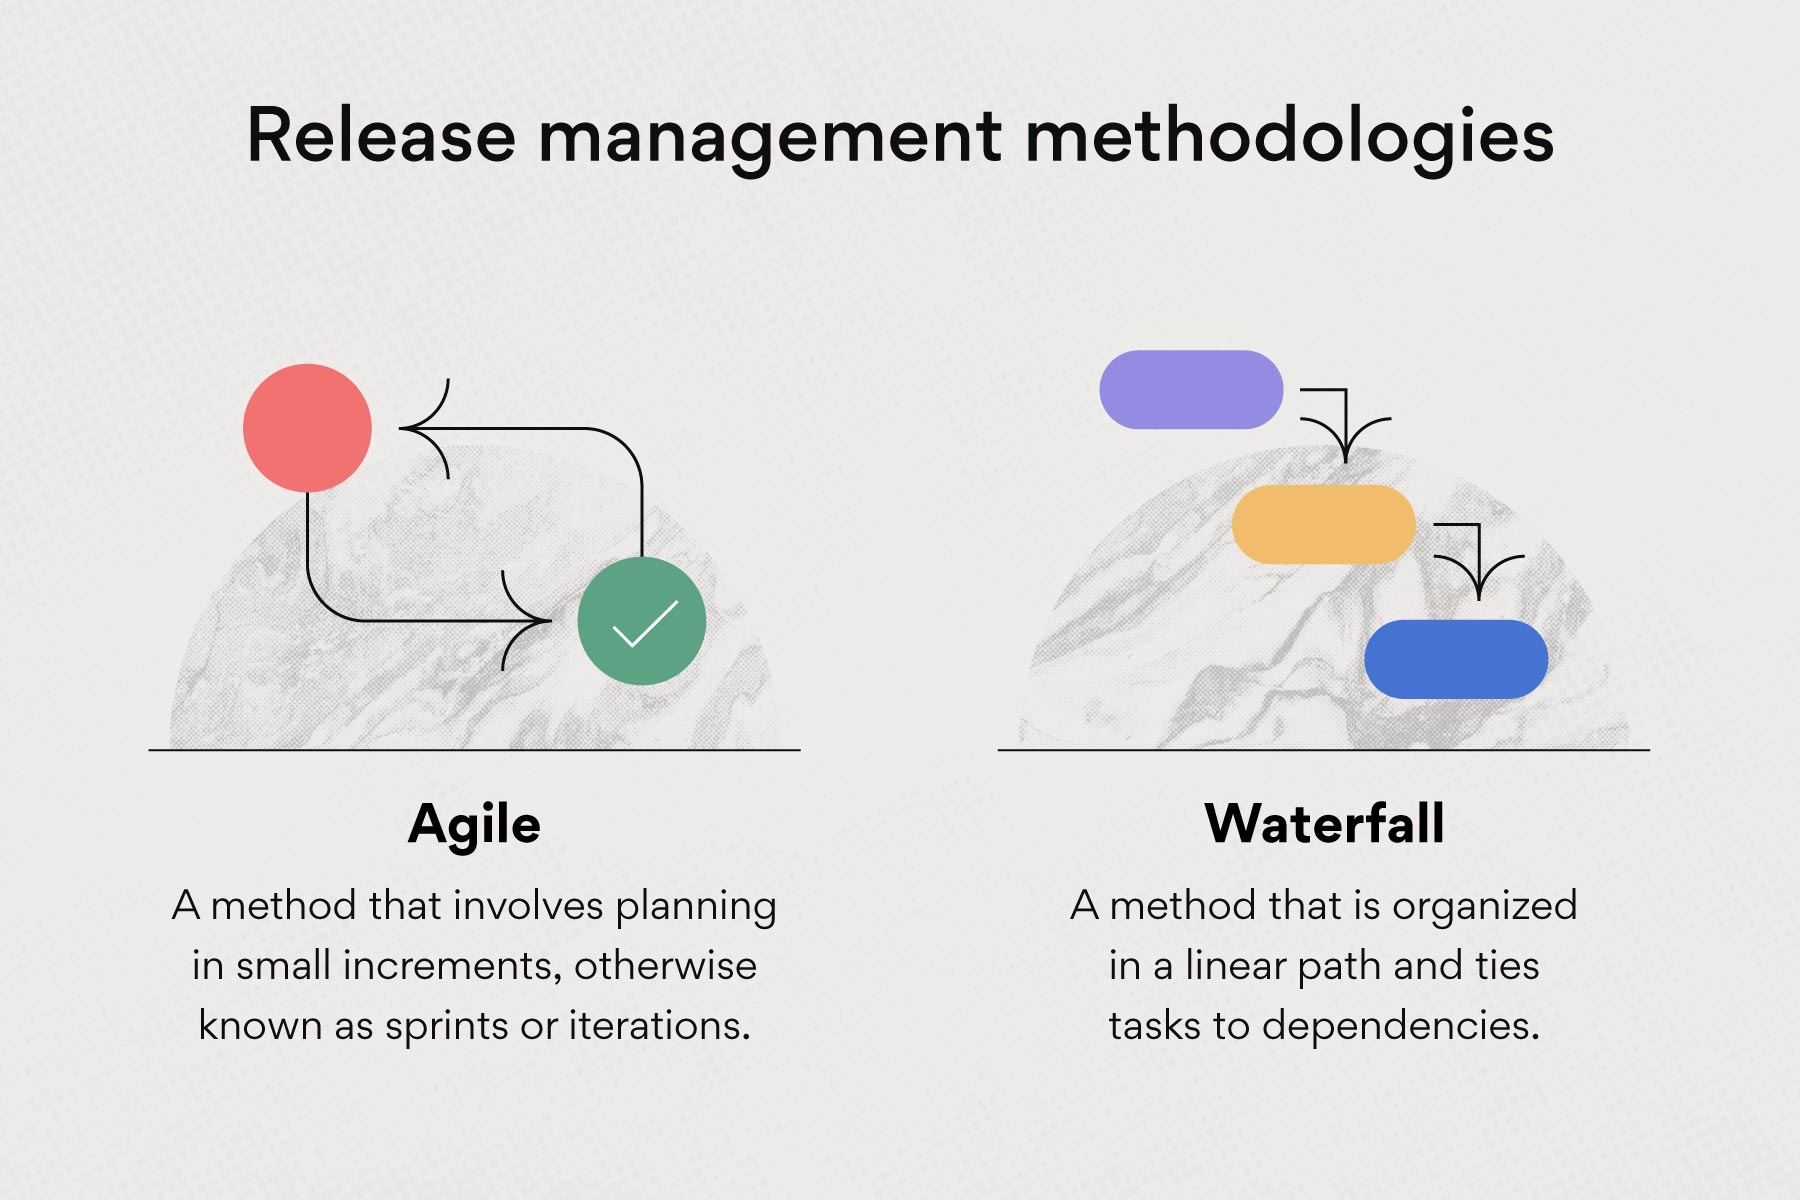 Release management methodologies